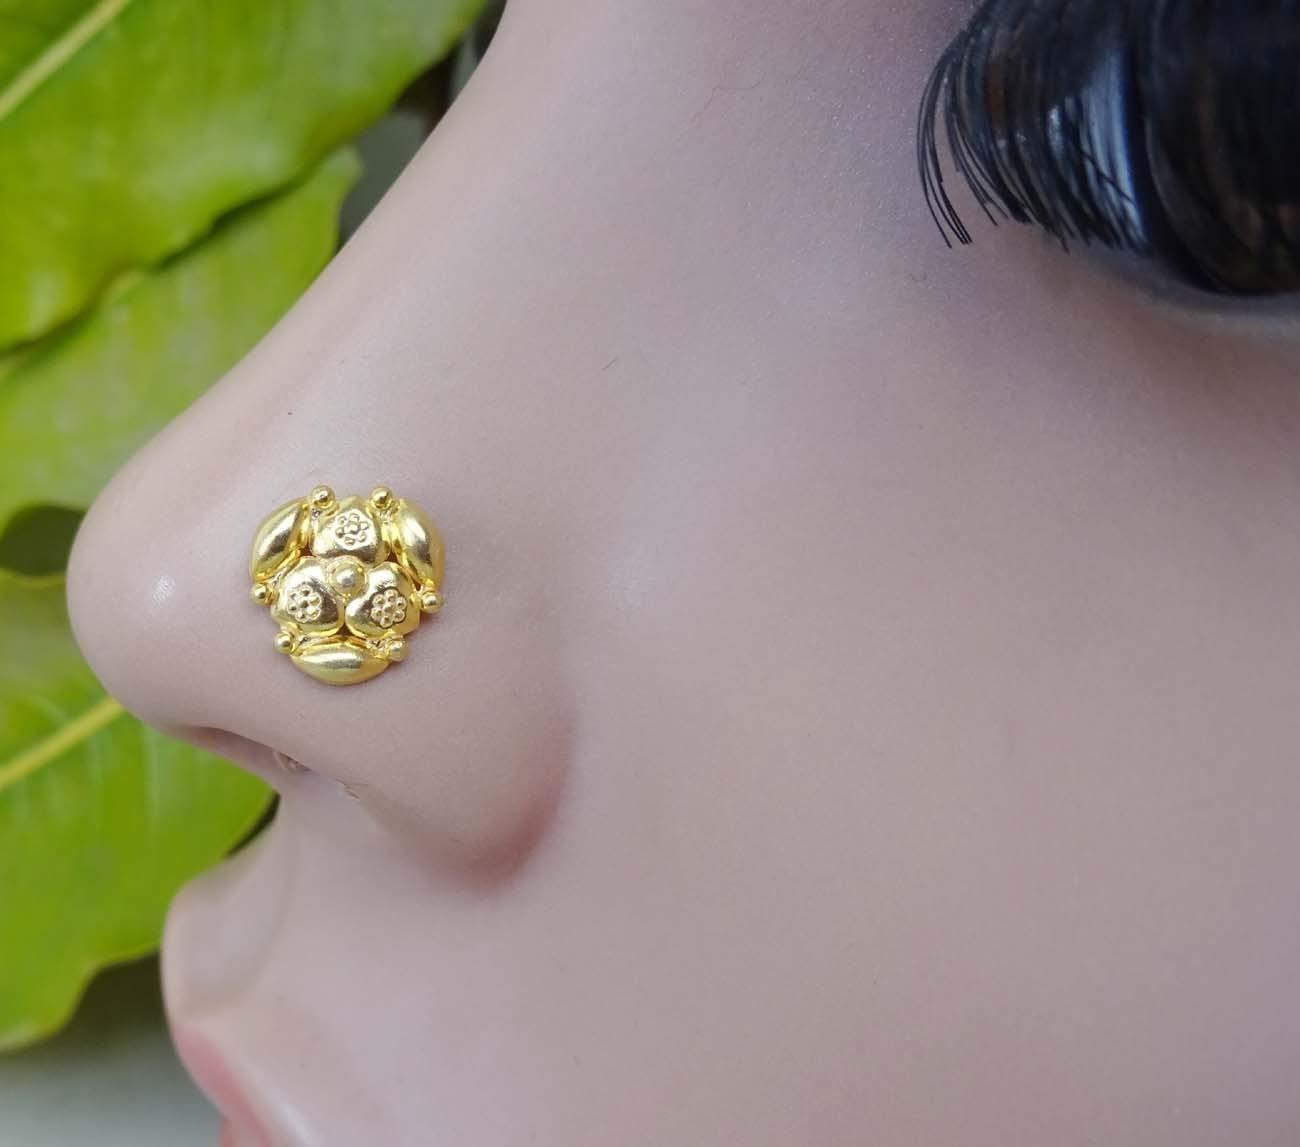 Gold Nose Piercing,Indian Nose Screw,Crock Screw Nose Stud,Indian Nose Stud,925 Sterling Silver nose stud,Gold Nose Screw,Unique Nose Stud,22 G Nose Stud,Gold Nose Pin,Gold Nose Piercing (TEJ078)